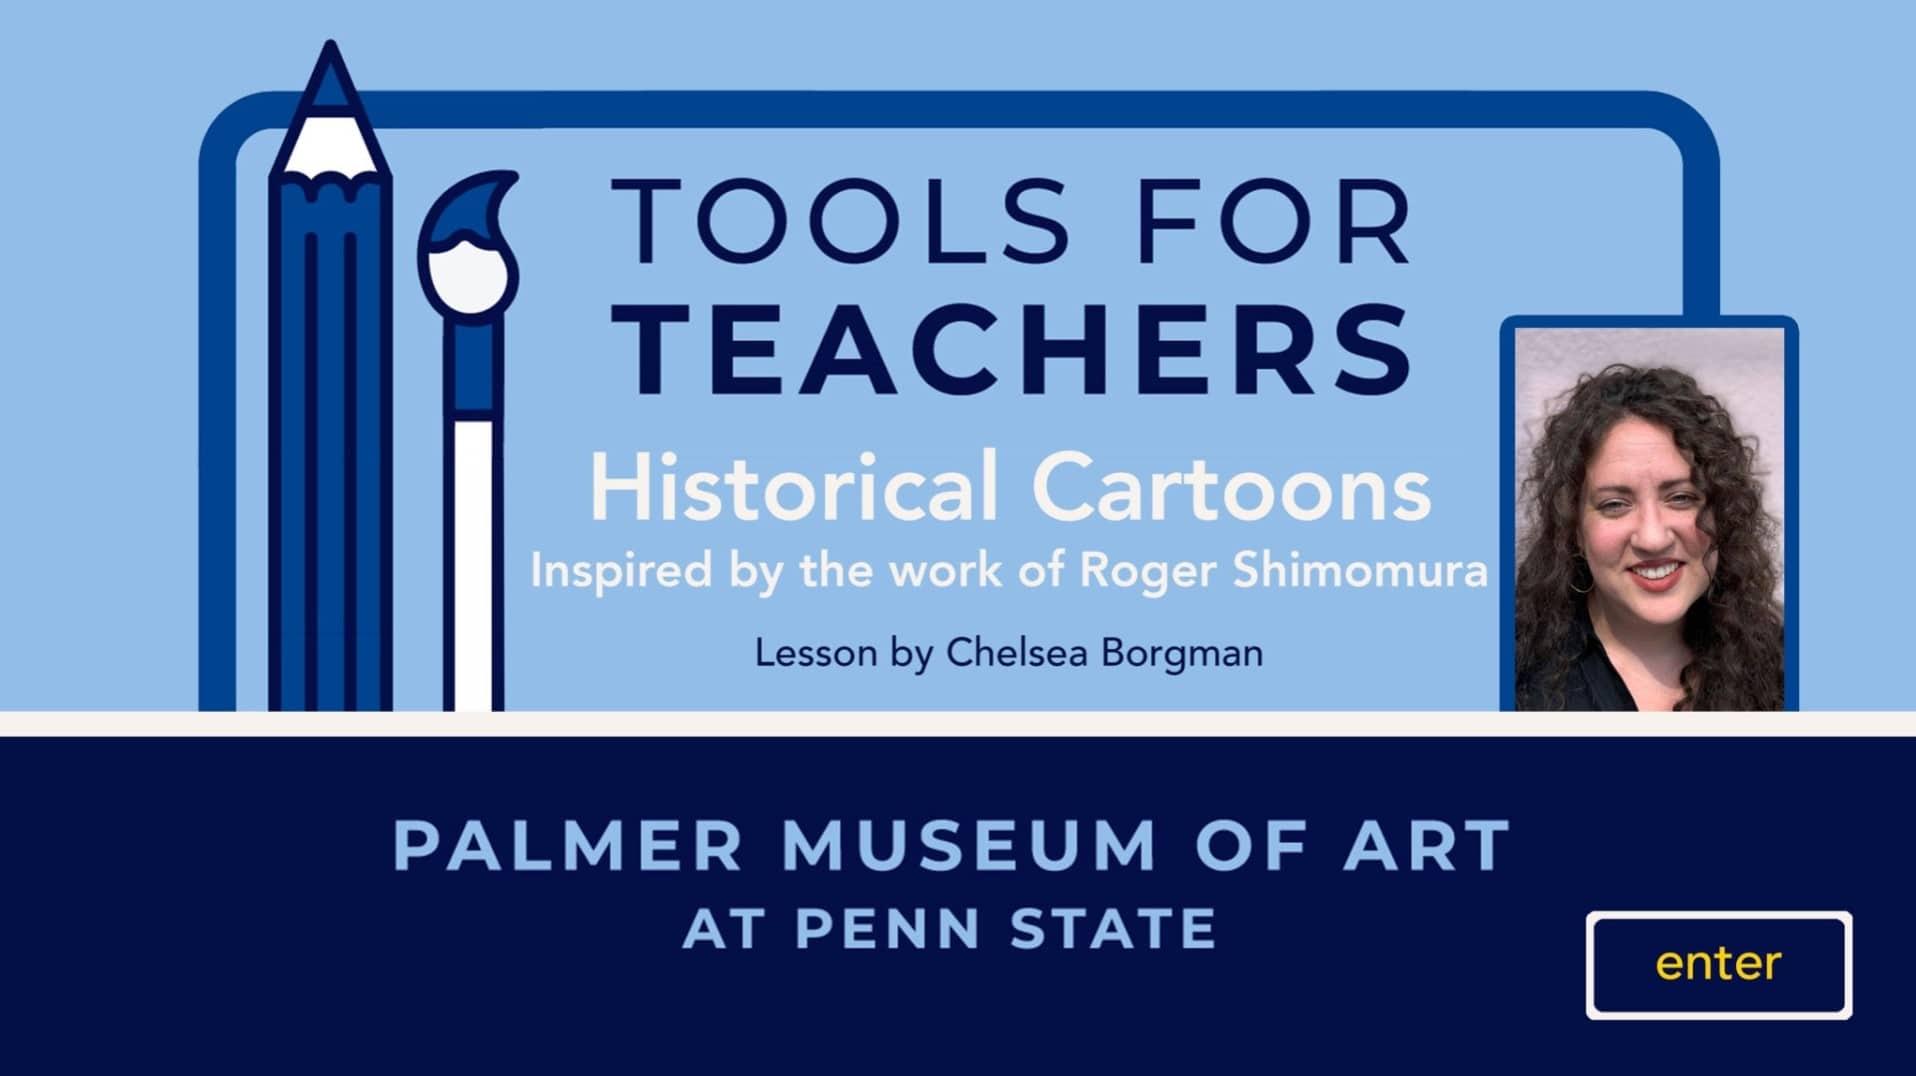 Tools for Teachers: Historical Cartoons